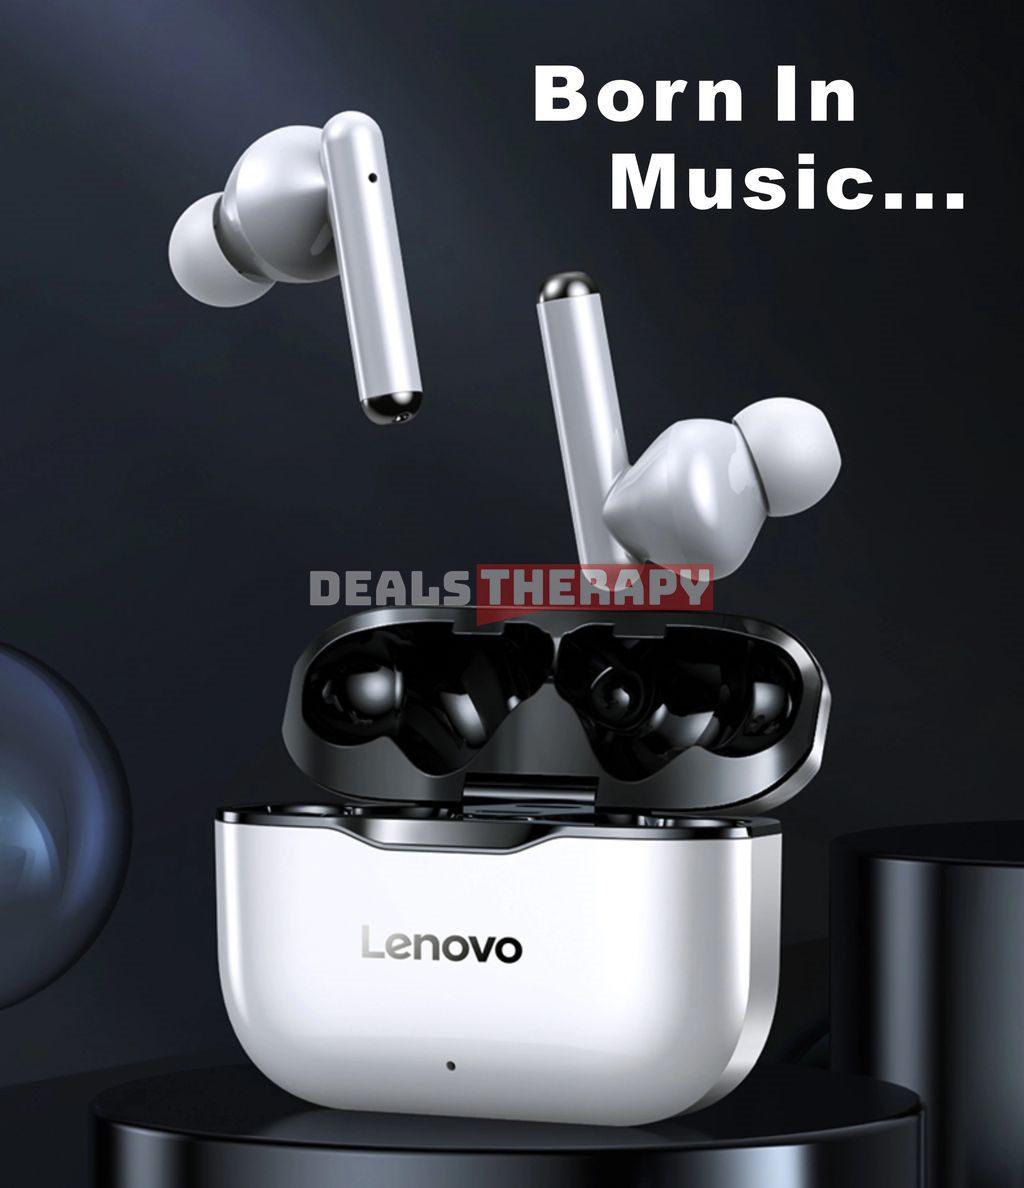 Lenovo LP1